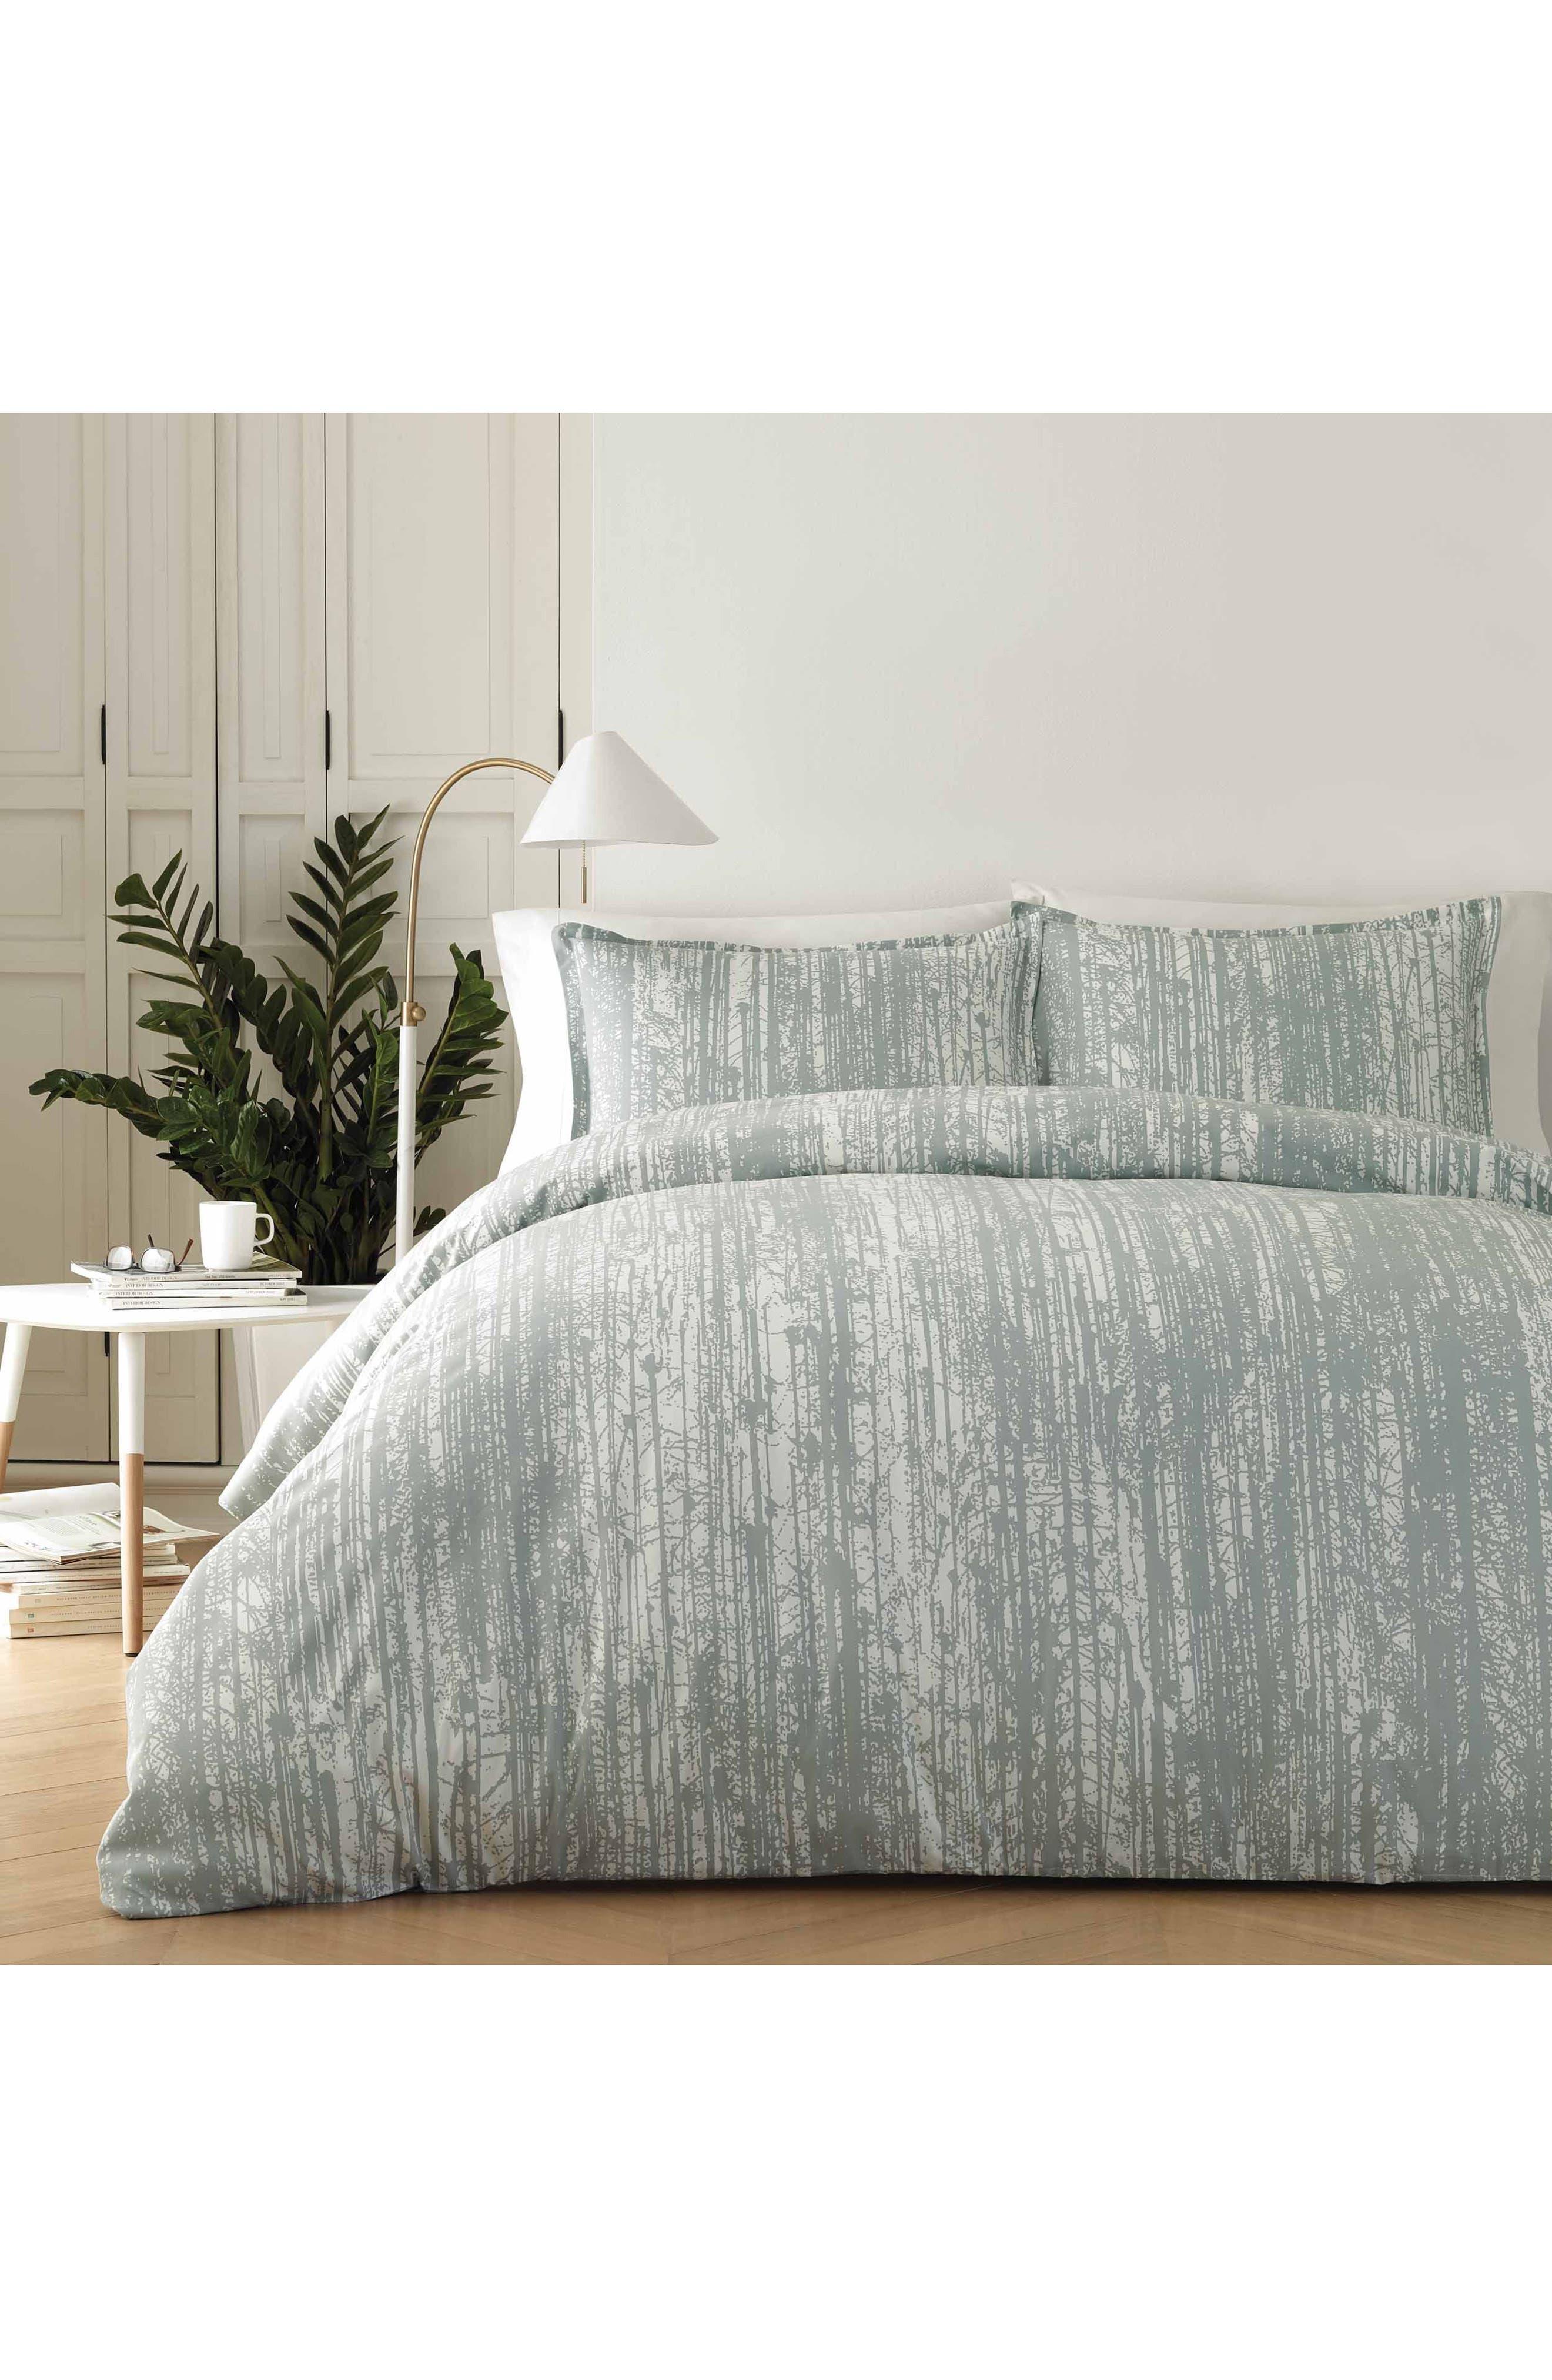 marimekko pihkassa comforter u0026 sham set - Marimekko Bedding